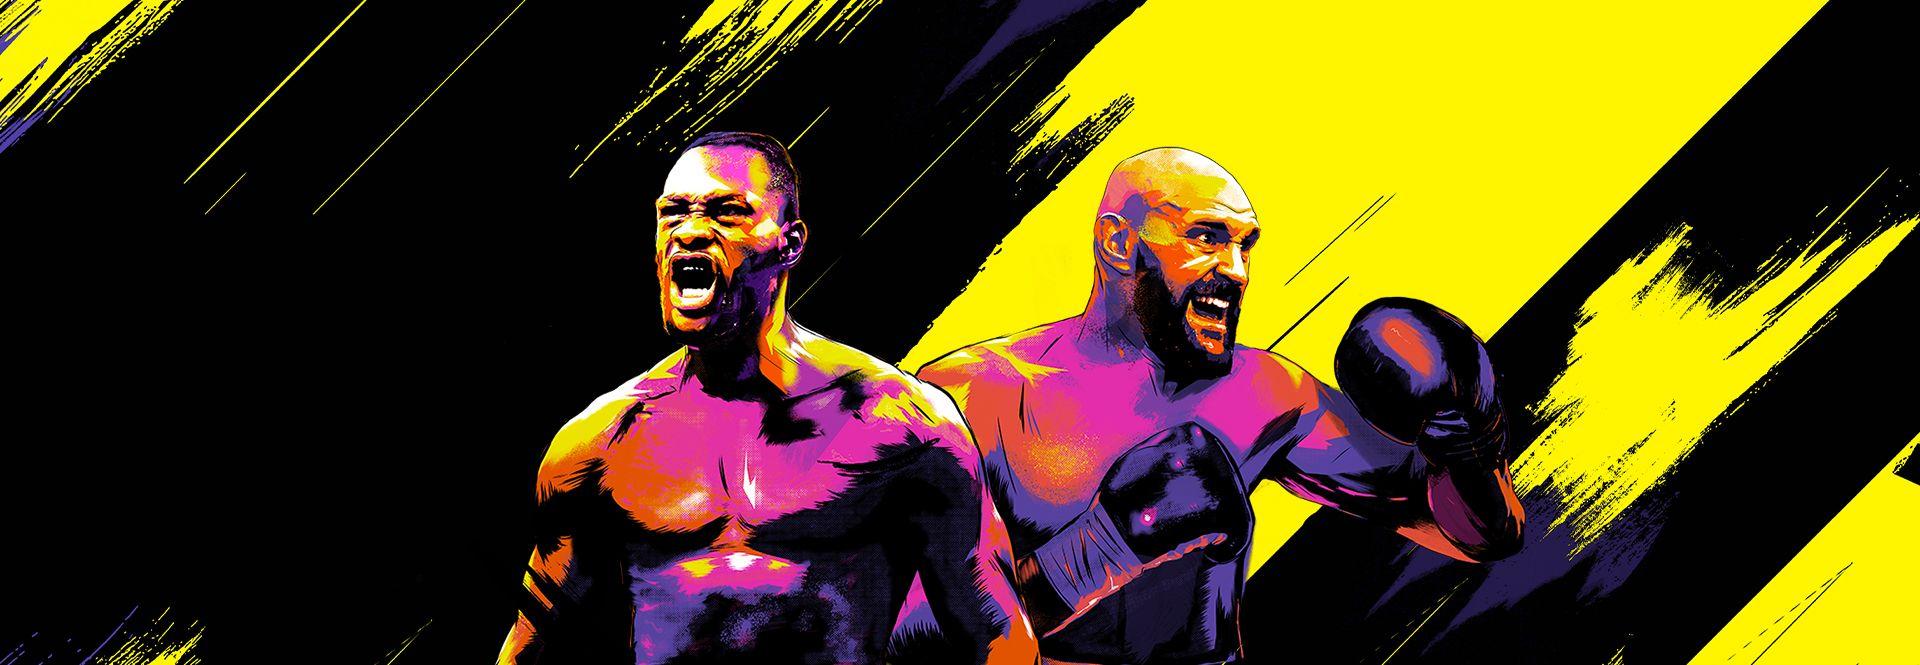 [Webapp] Sport - Boxe combat digital